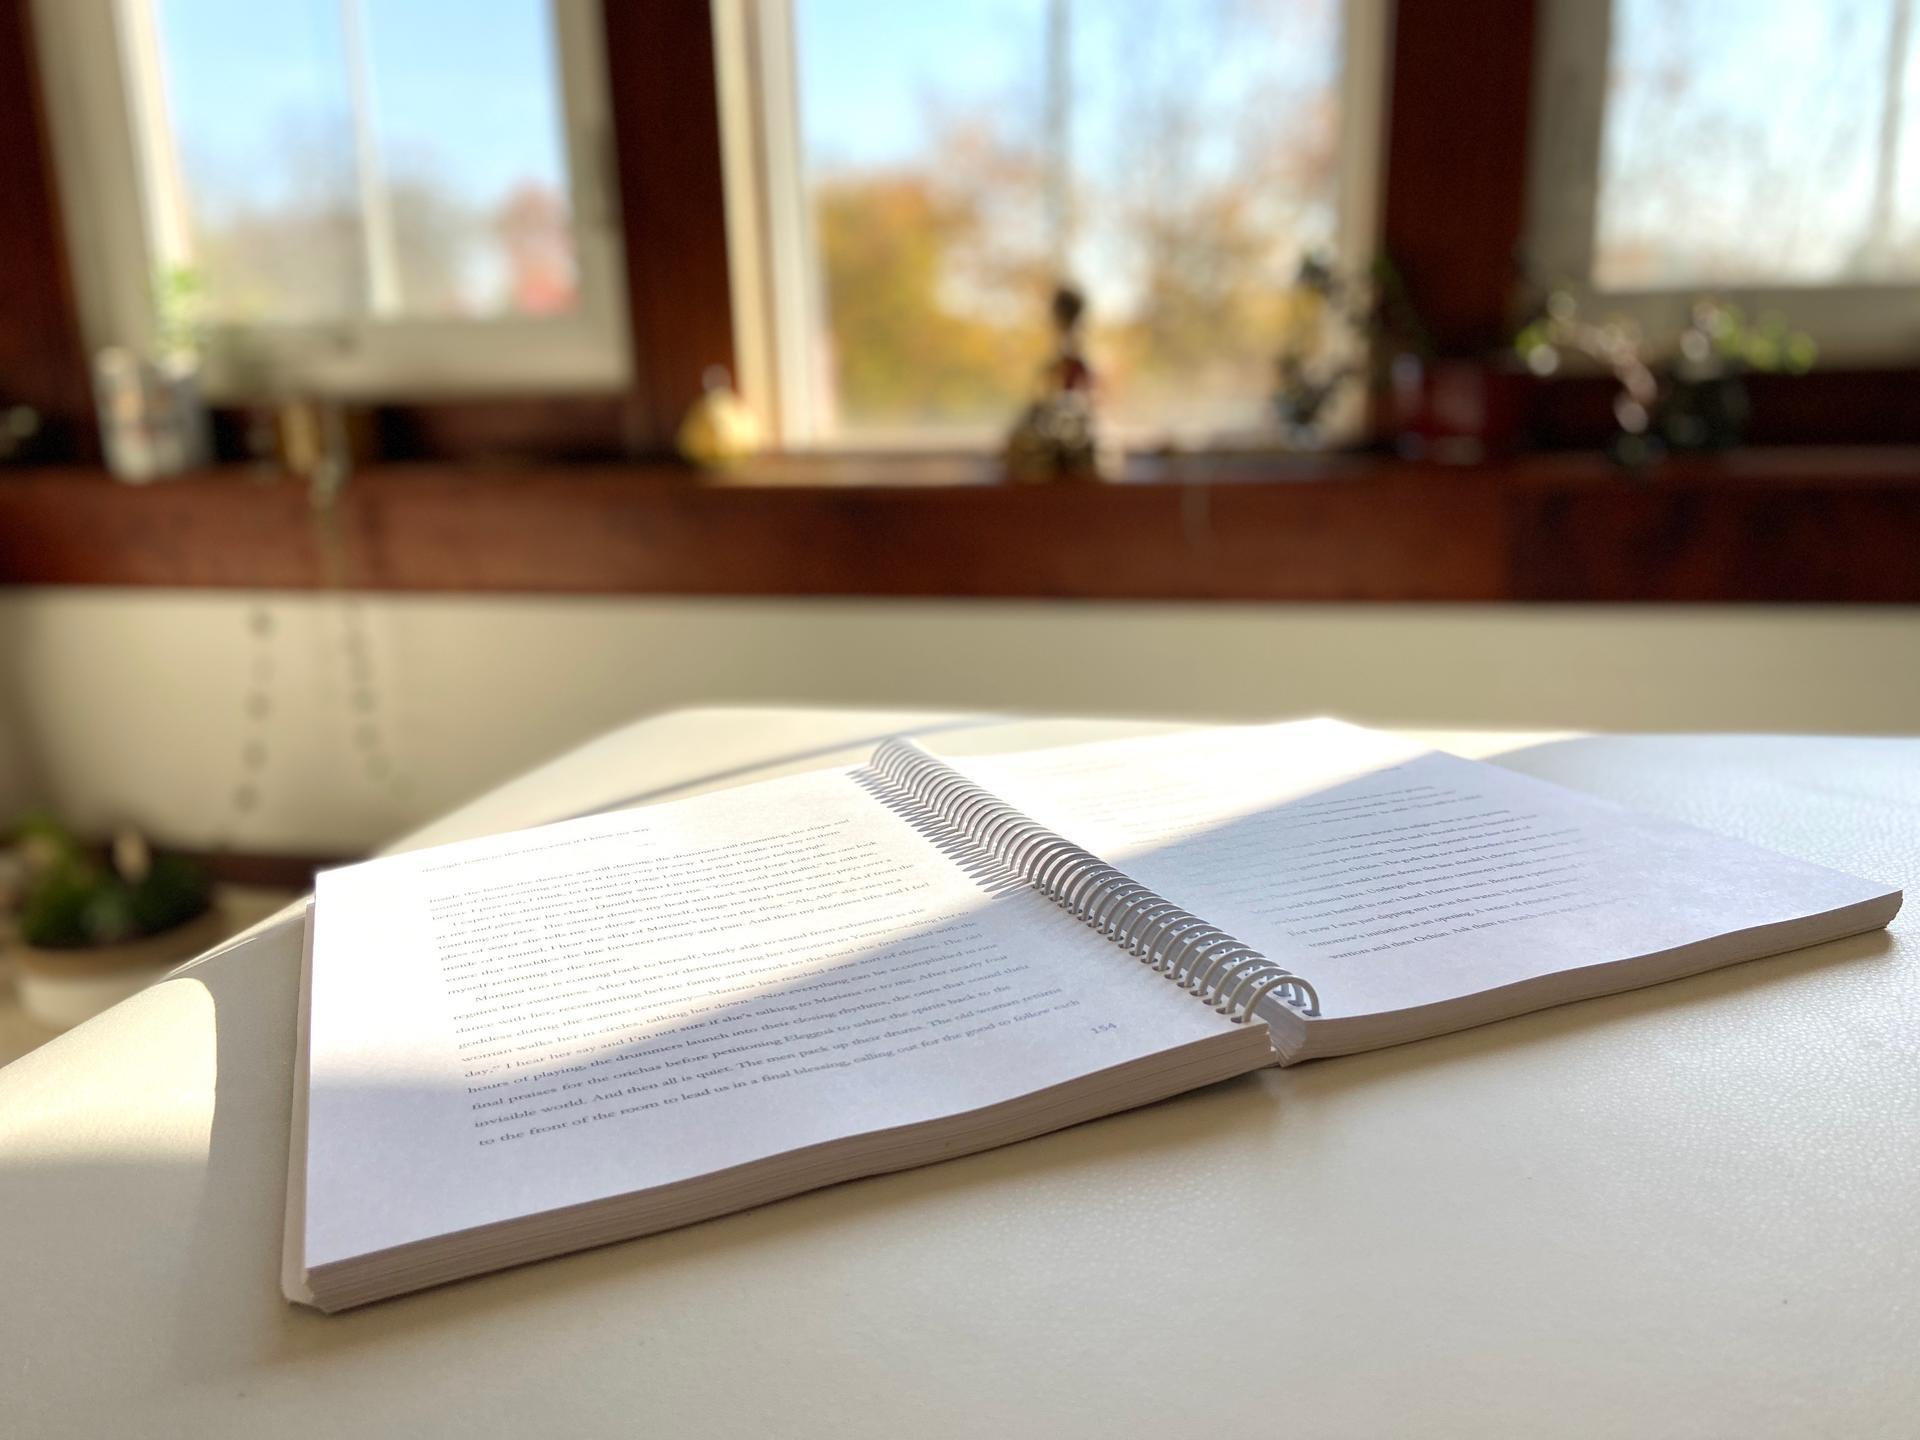 open memoir book manuscript in writing studio with window and Buddha